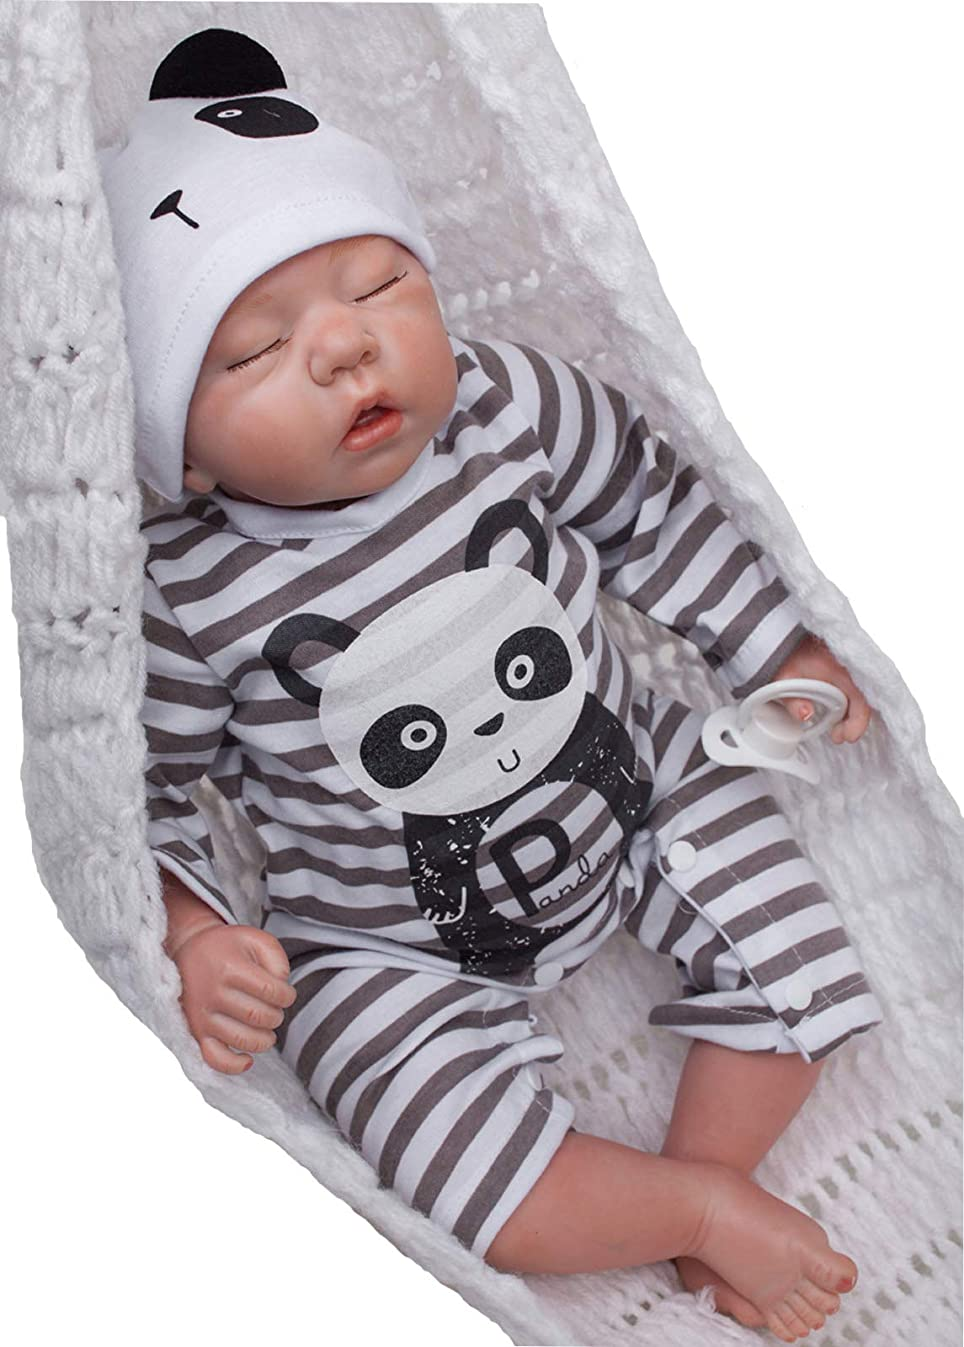 Wamdoll Rare Alive Collectible Sleepy Reborn Baby Girl Boy Dolls Look Real